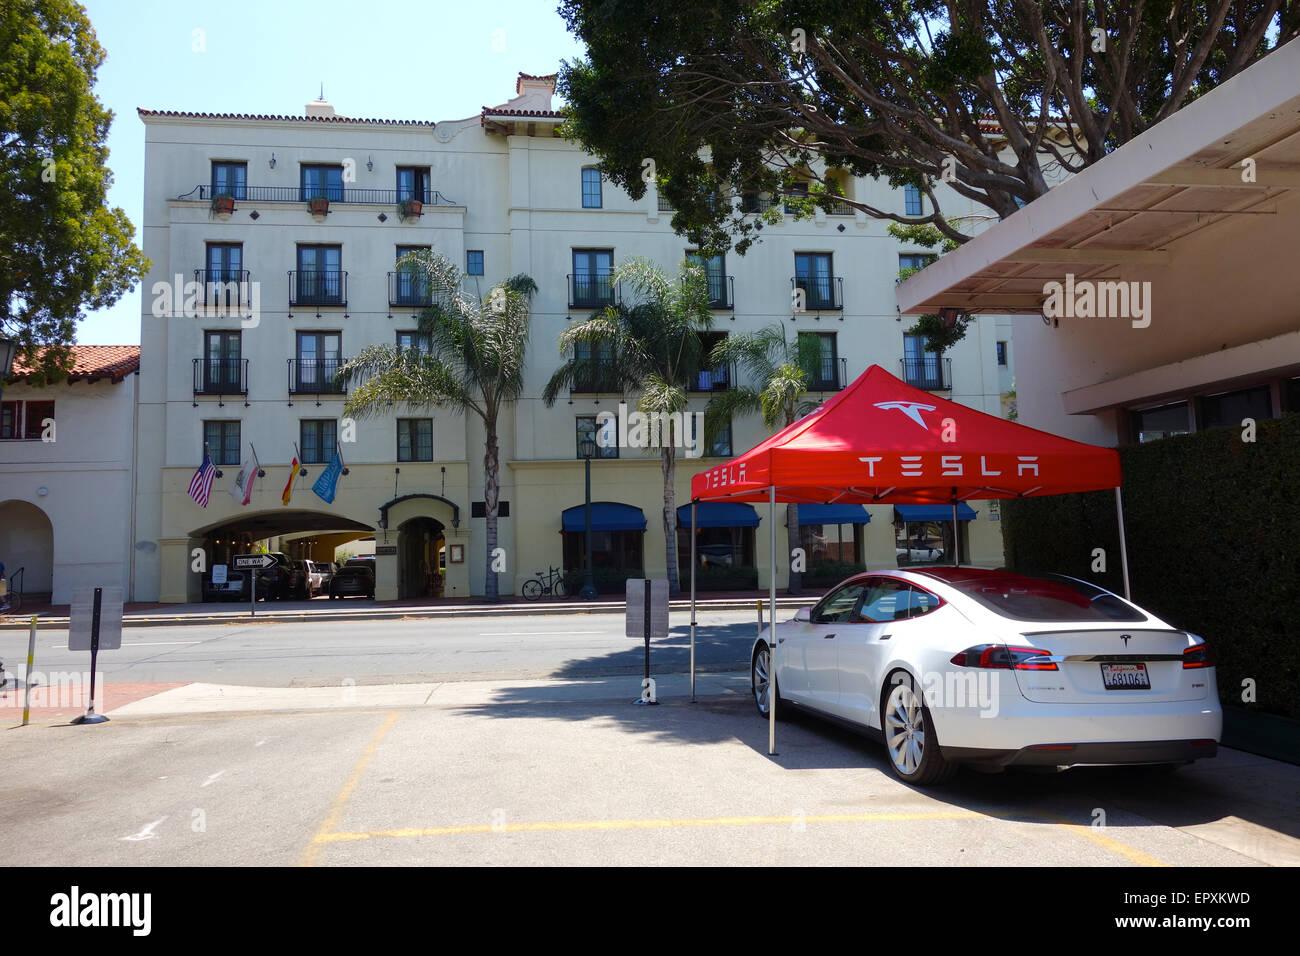 Santa Barbara, California USA- 22nd May, 2015 The first U.S. Tesla Motors pop up mobile store opens today in Santa - Stock Image